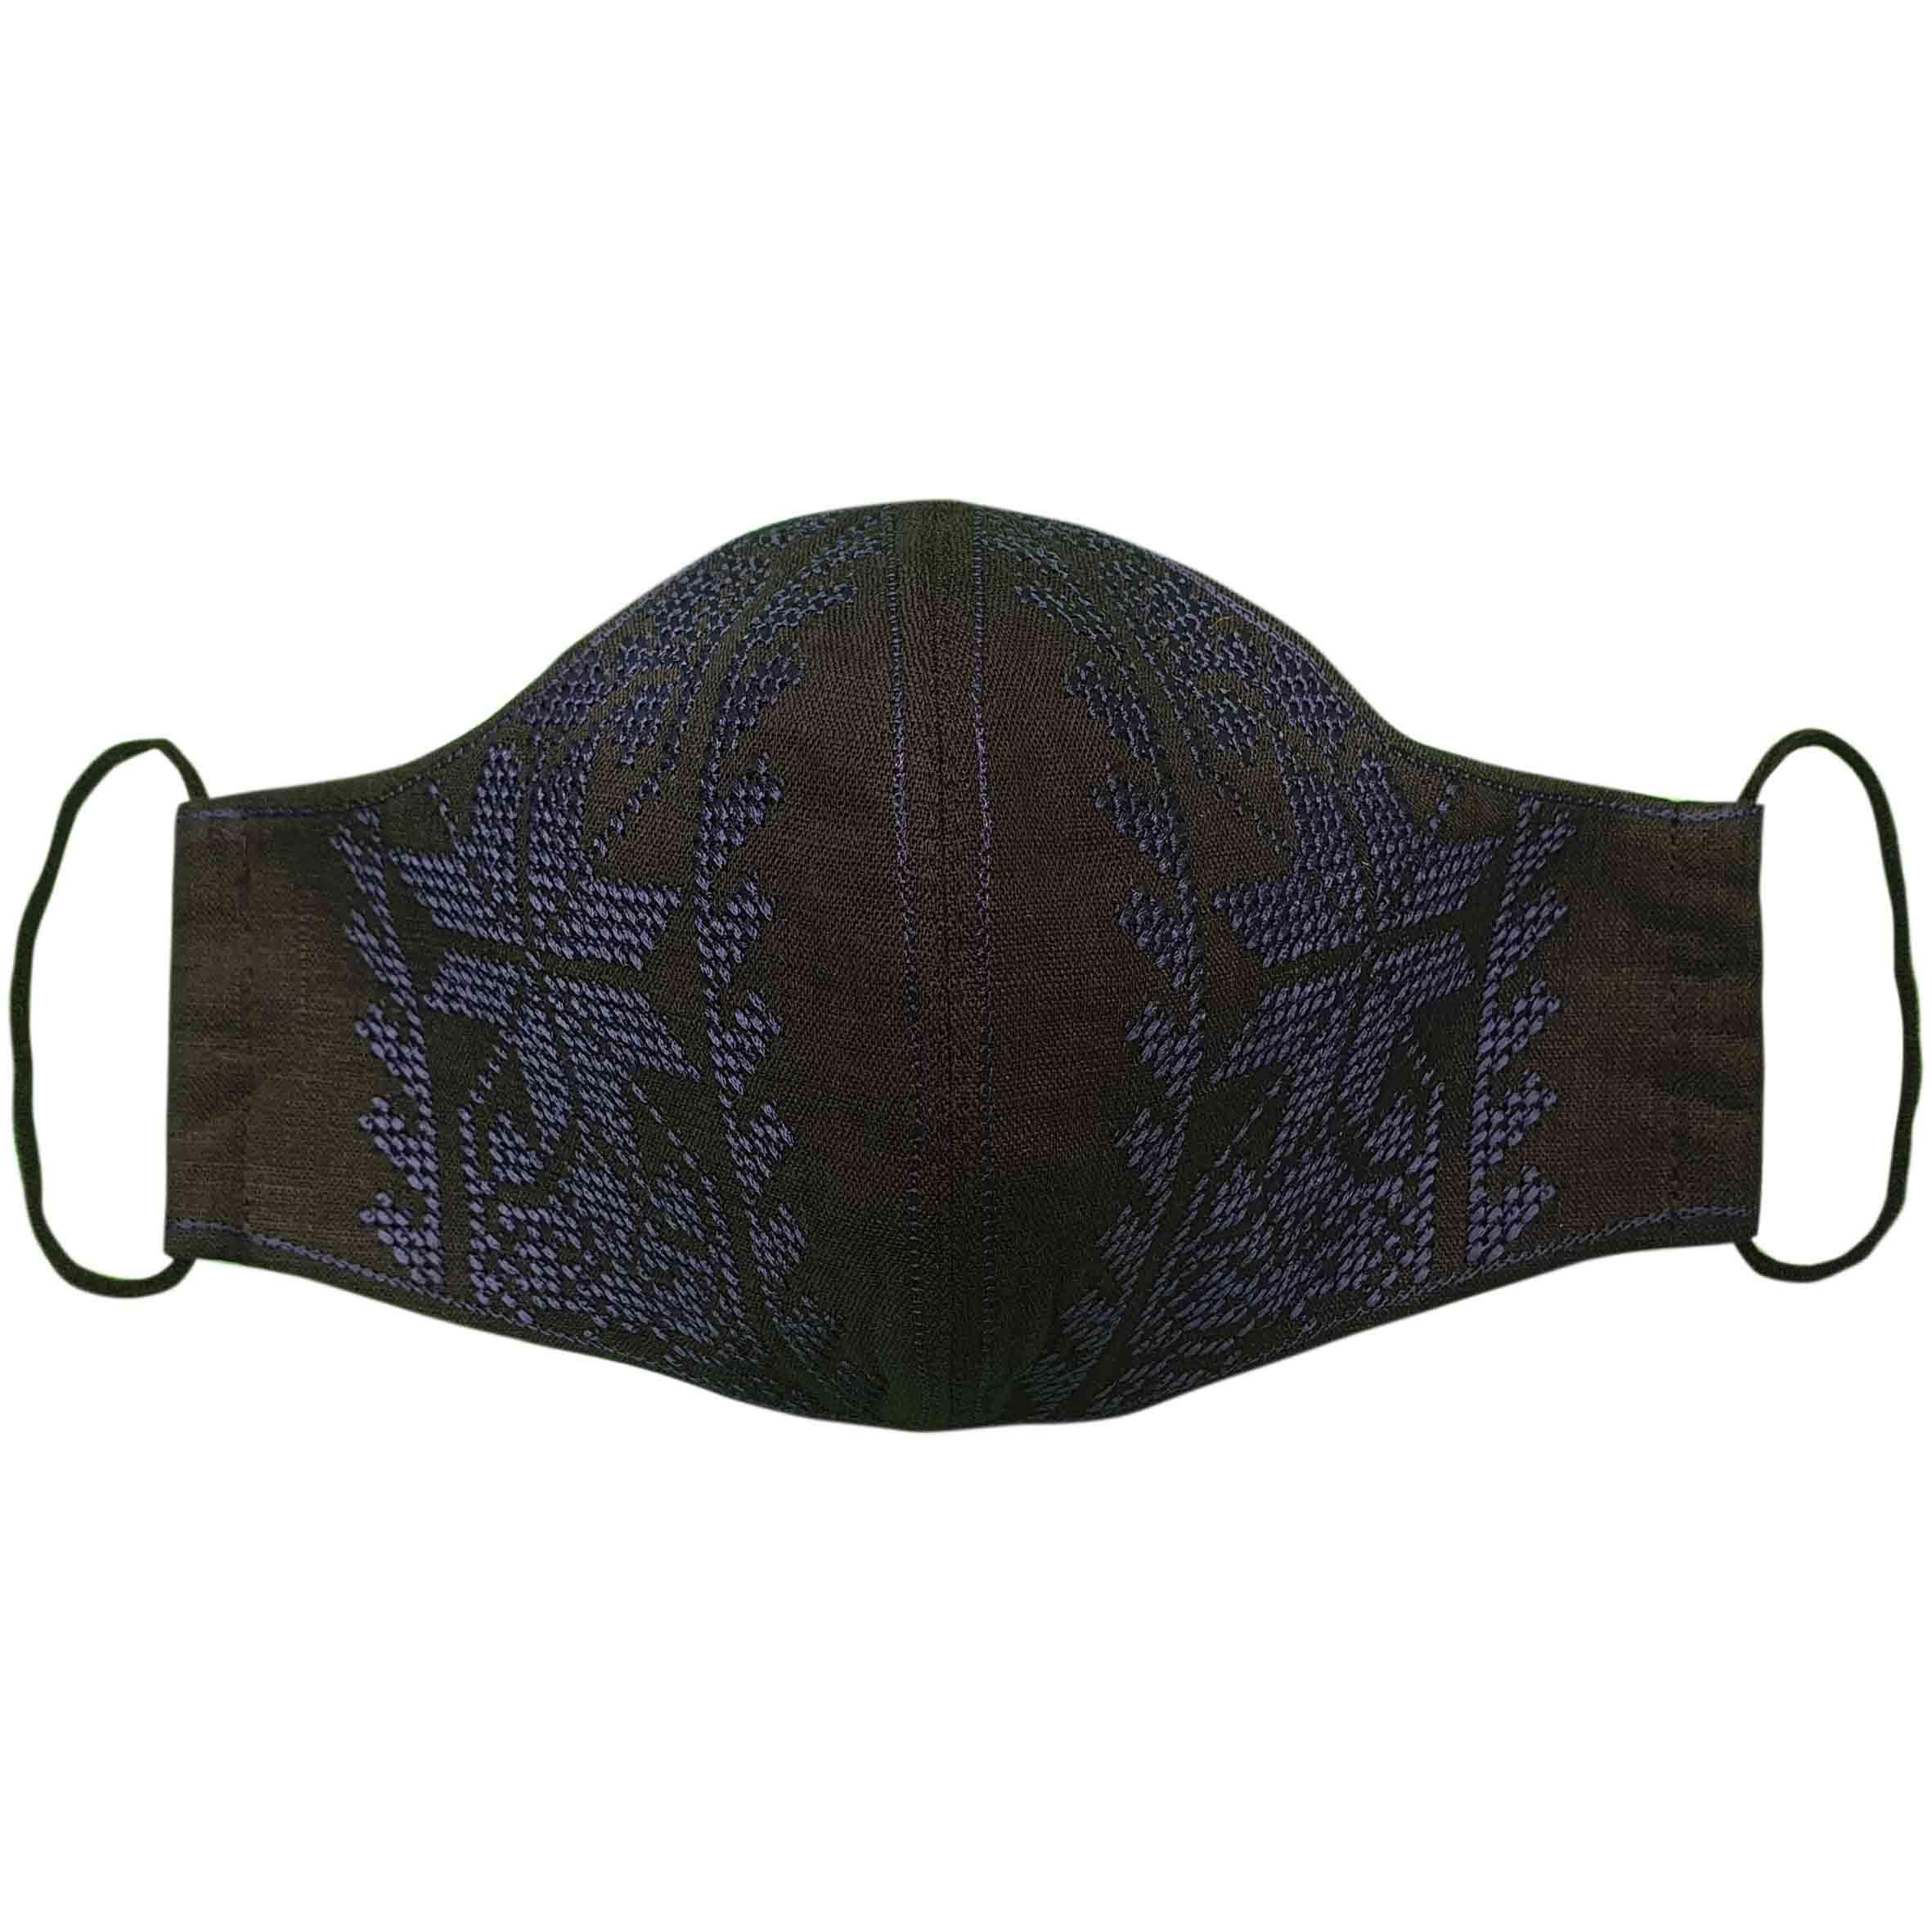 masks black reusable